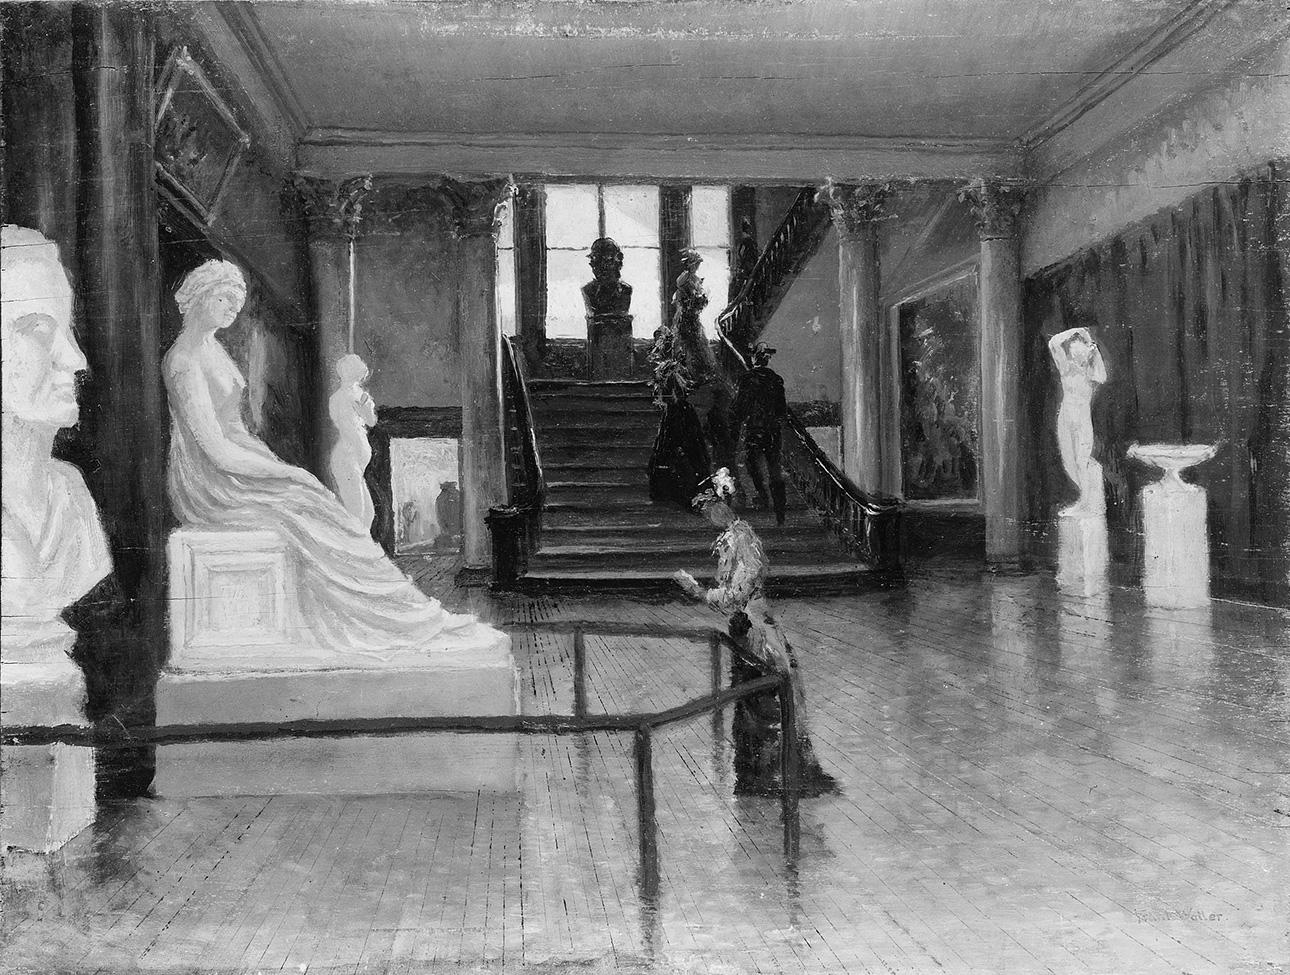 Entrance Hall of the Metropolitan Museum of Art when in Fourteenth Street | Frank Waller